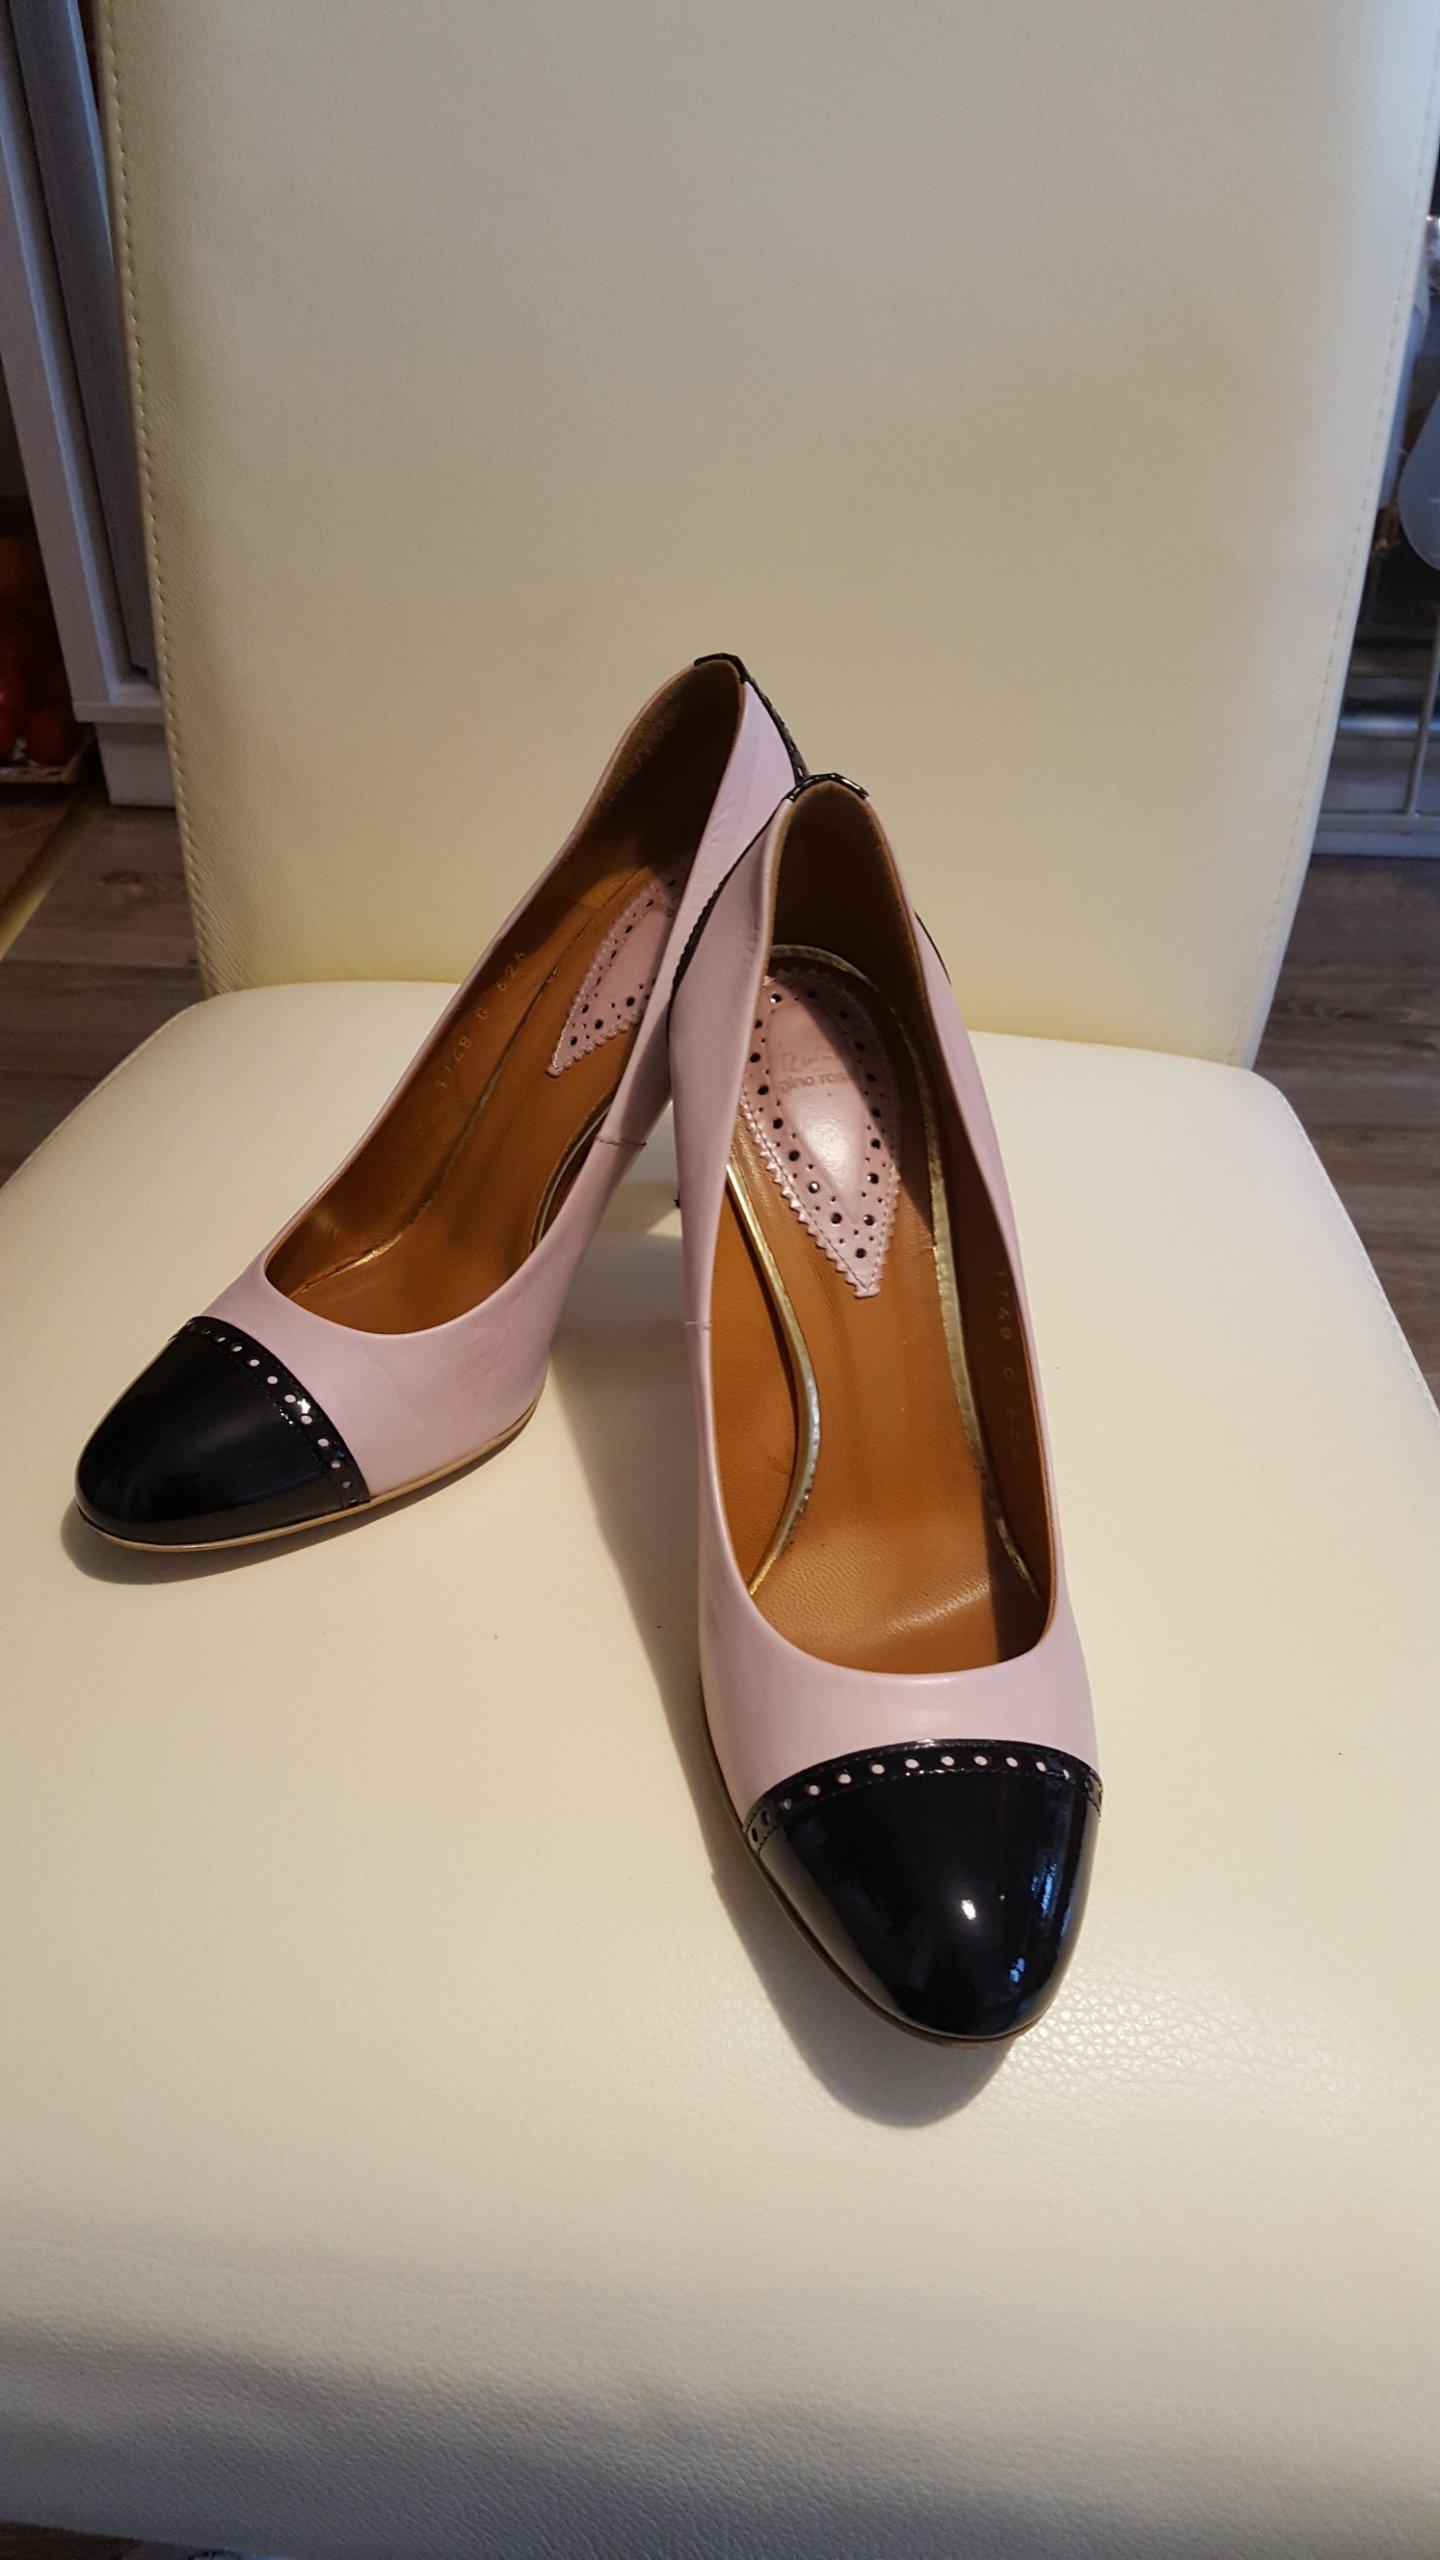 Gino Rossi buty damskie.